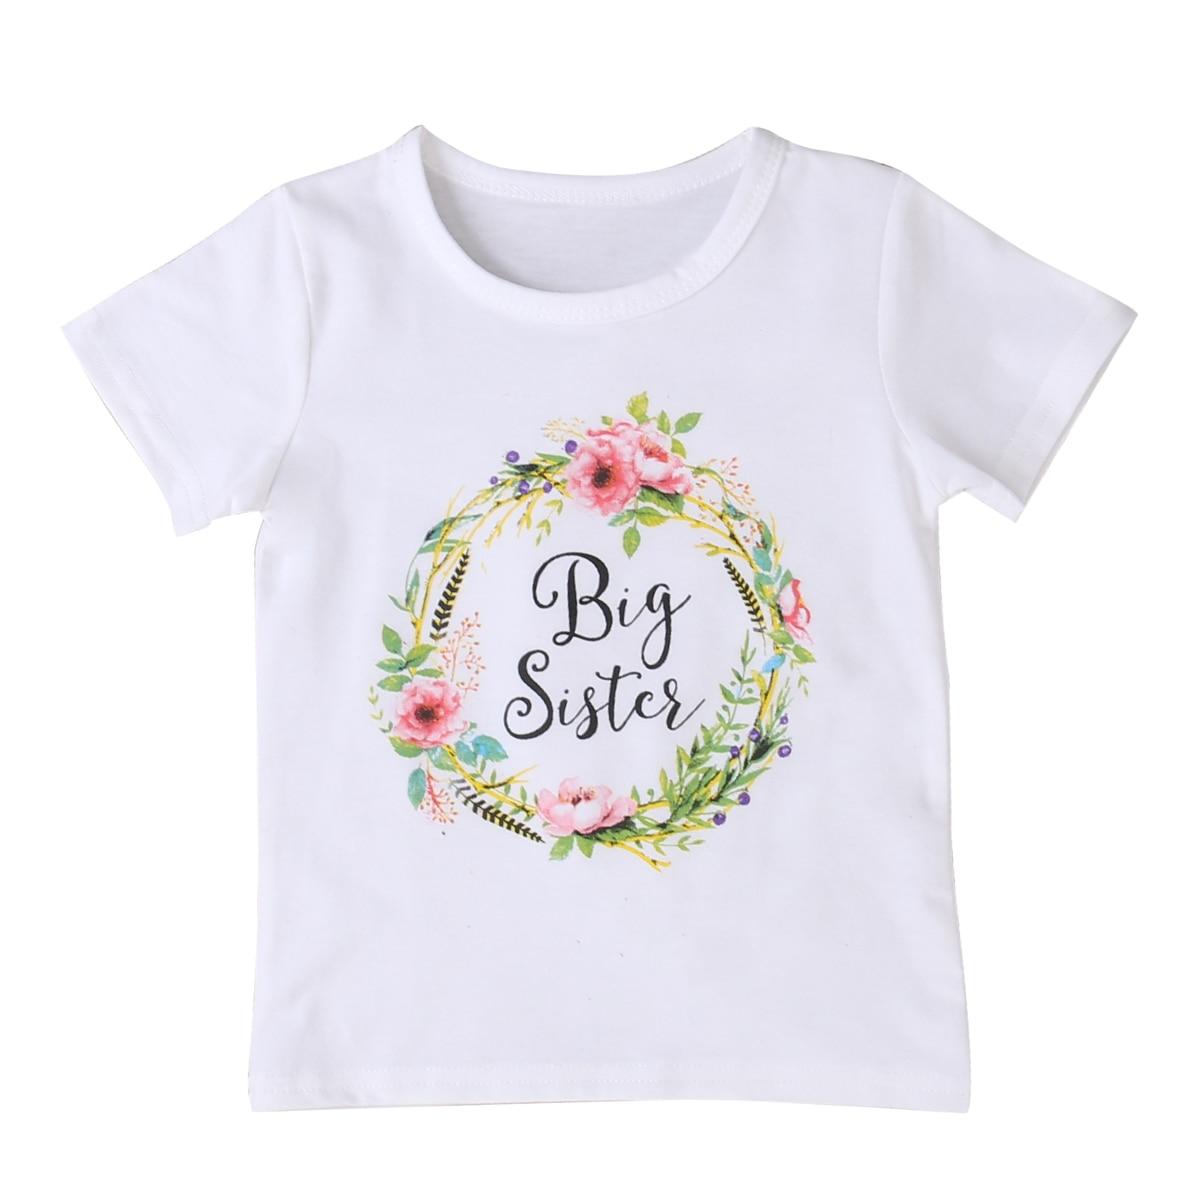 Girls t shirts short sleeve flower outfits t shirt baby for Newborn girl t shirts